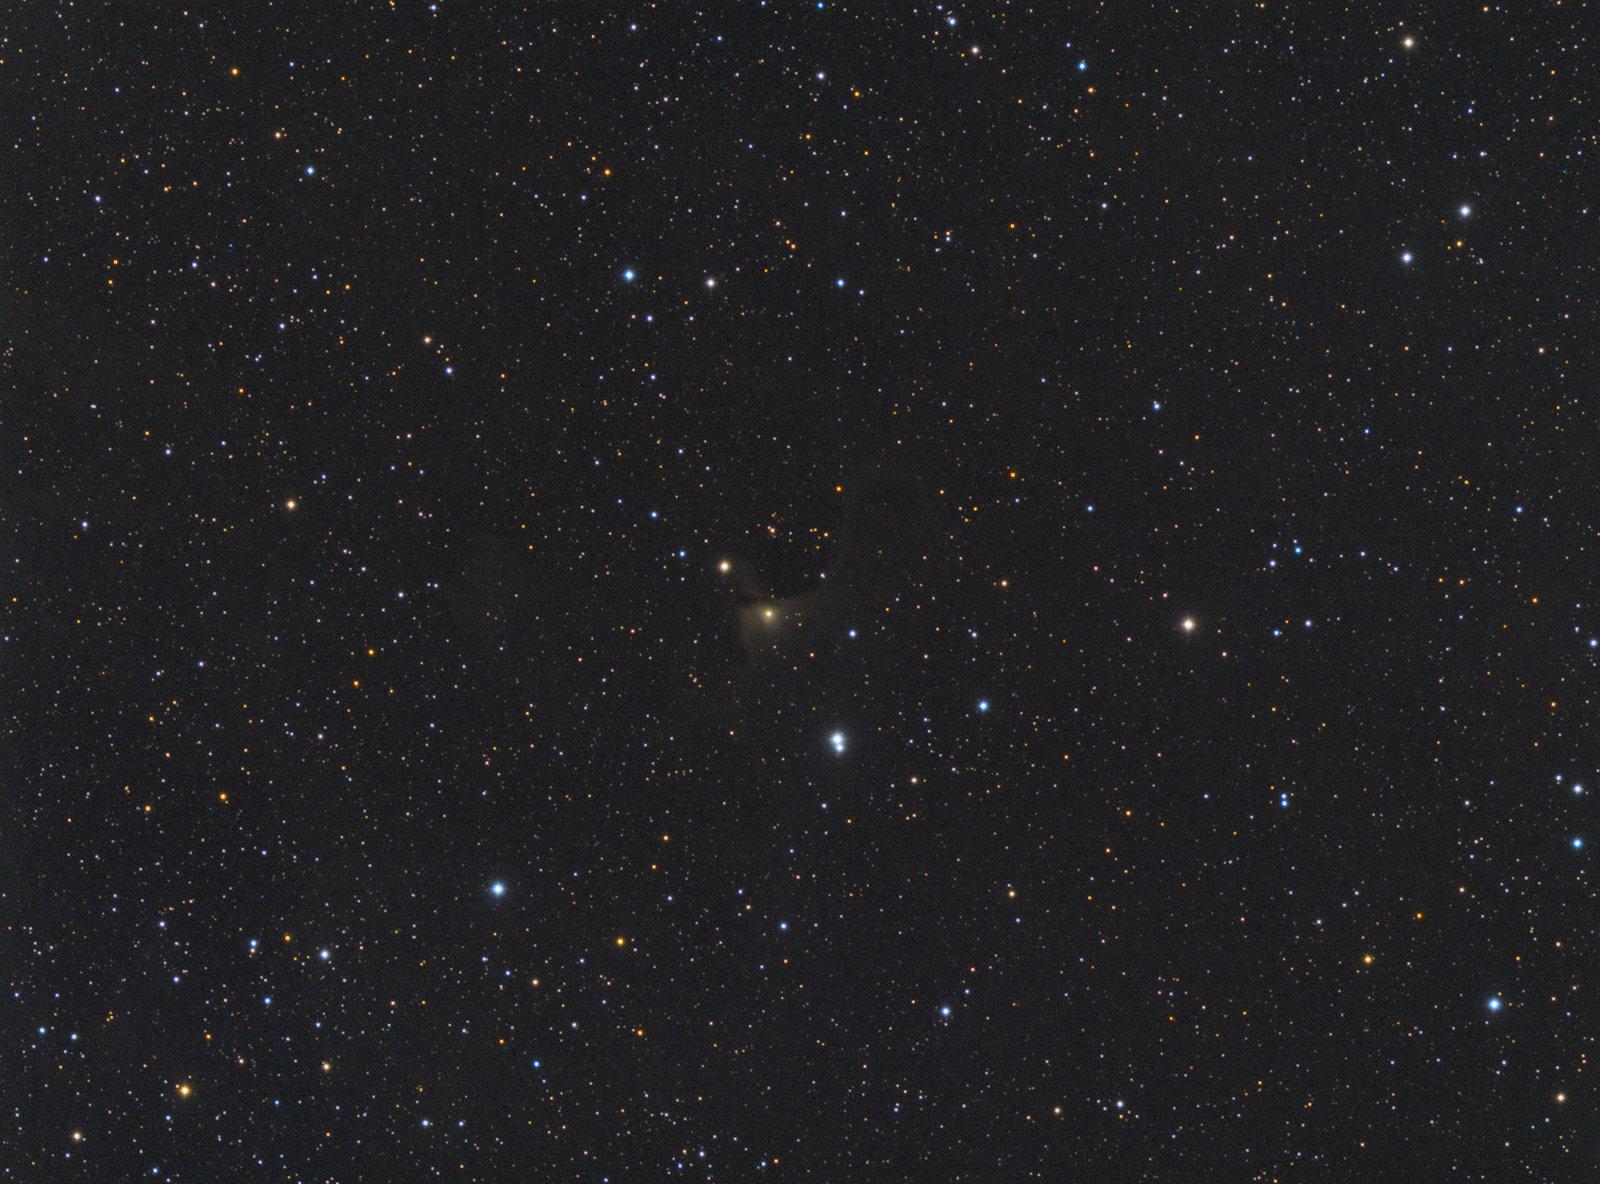 vdB141_RGB_SC_eXc_HT_cr_cb_ARG_col_stars_col_stars_bckgr_1920px.jpg